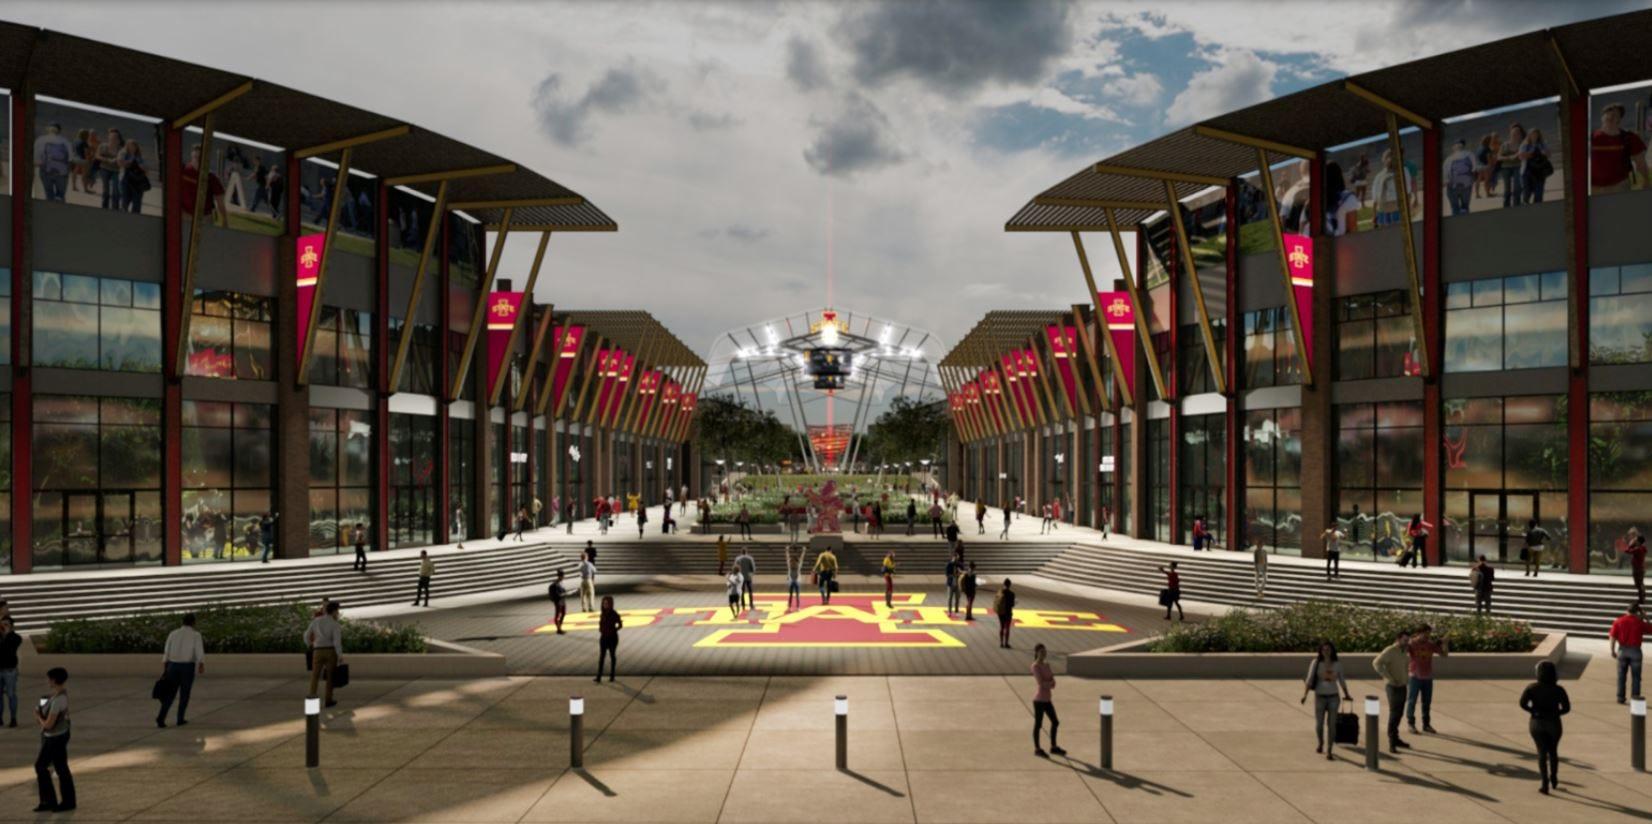 Photos: Proposed multi-use redevelopment near Jack Trice Stadium, Hilton Coliseum